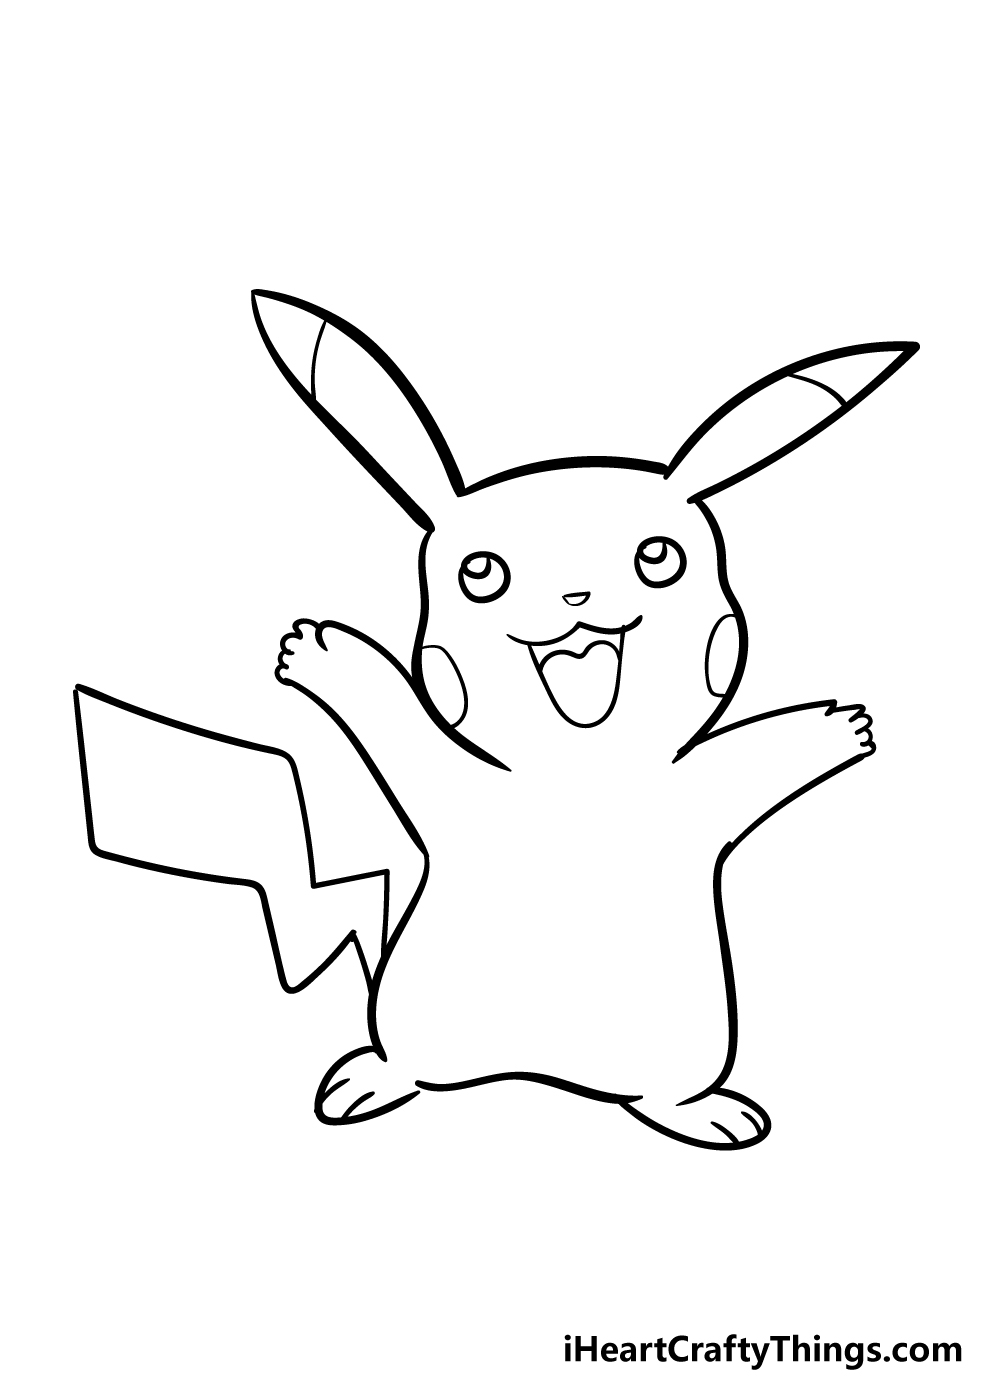 pikachu drawing step 6